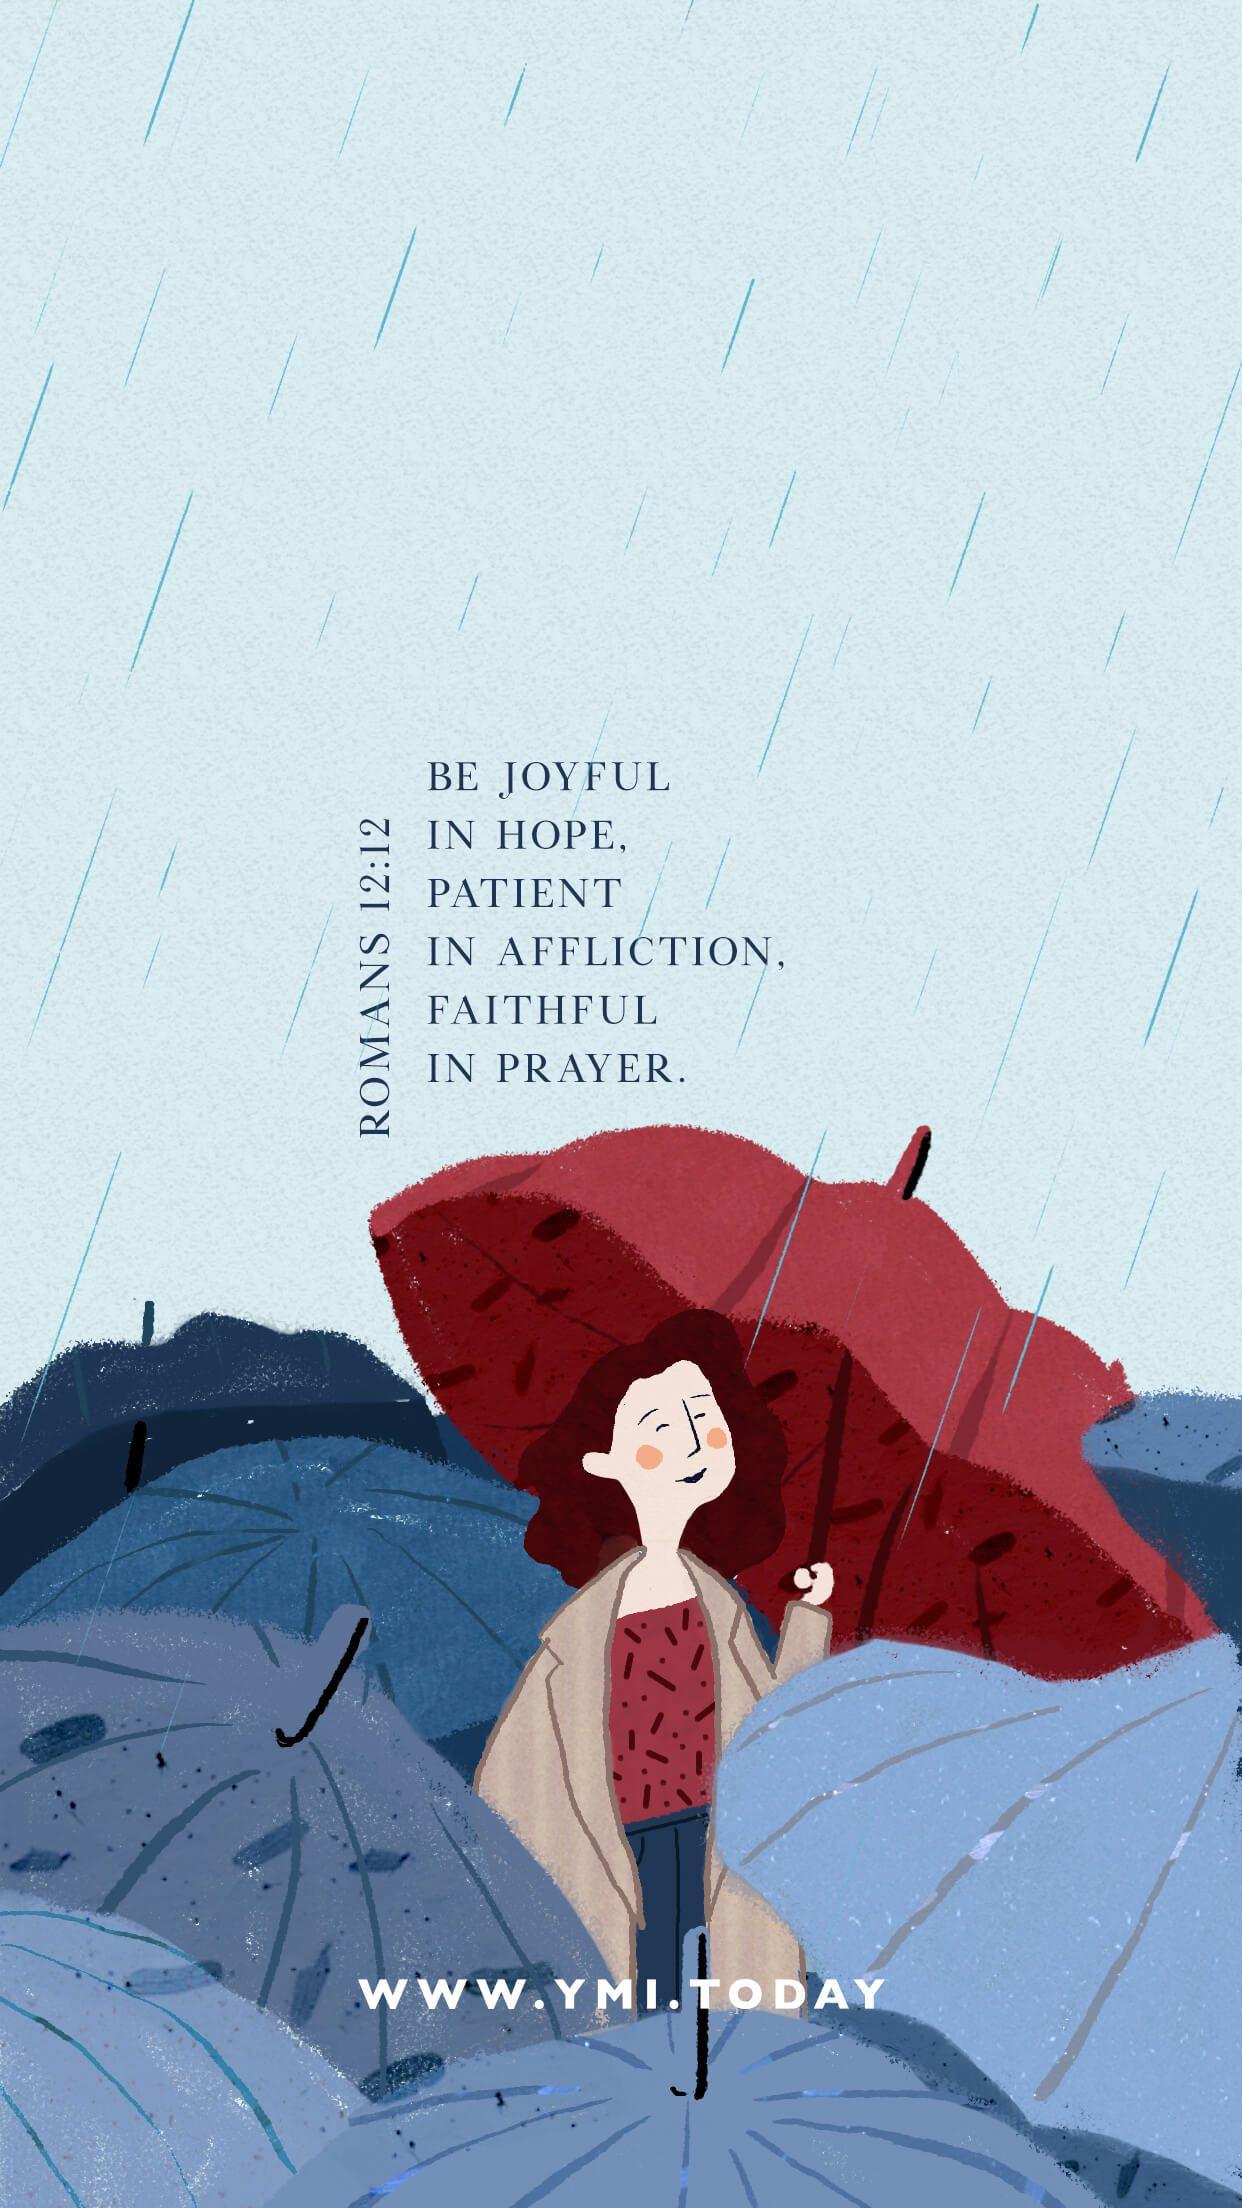 YMI March 2020 Phone Lockscreen - Be joyful in hope, patient in affliction, faithful in prayer. - Romans 12:12